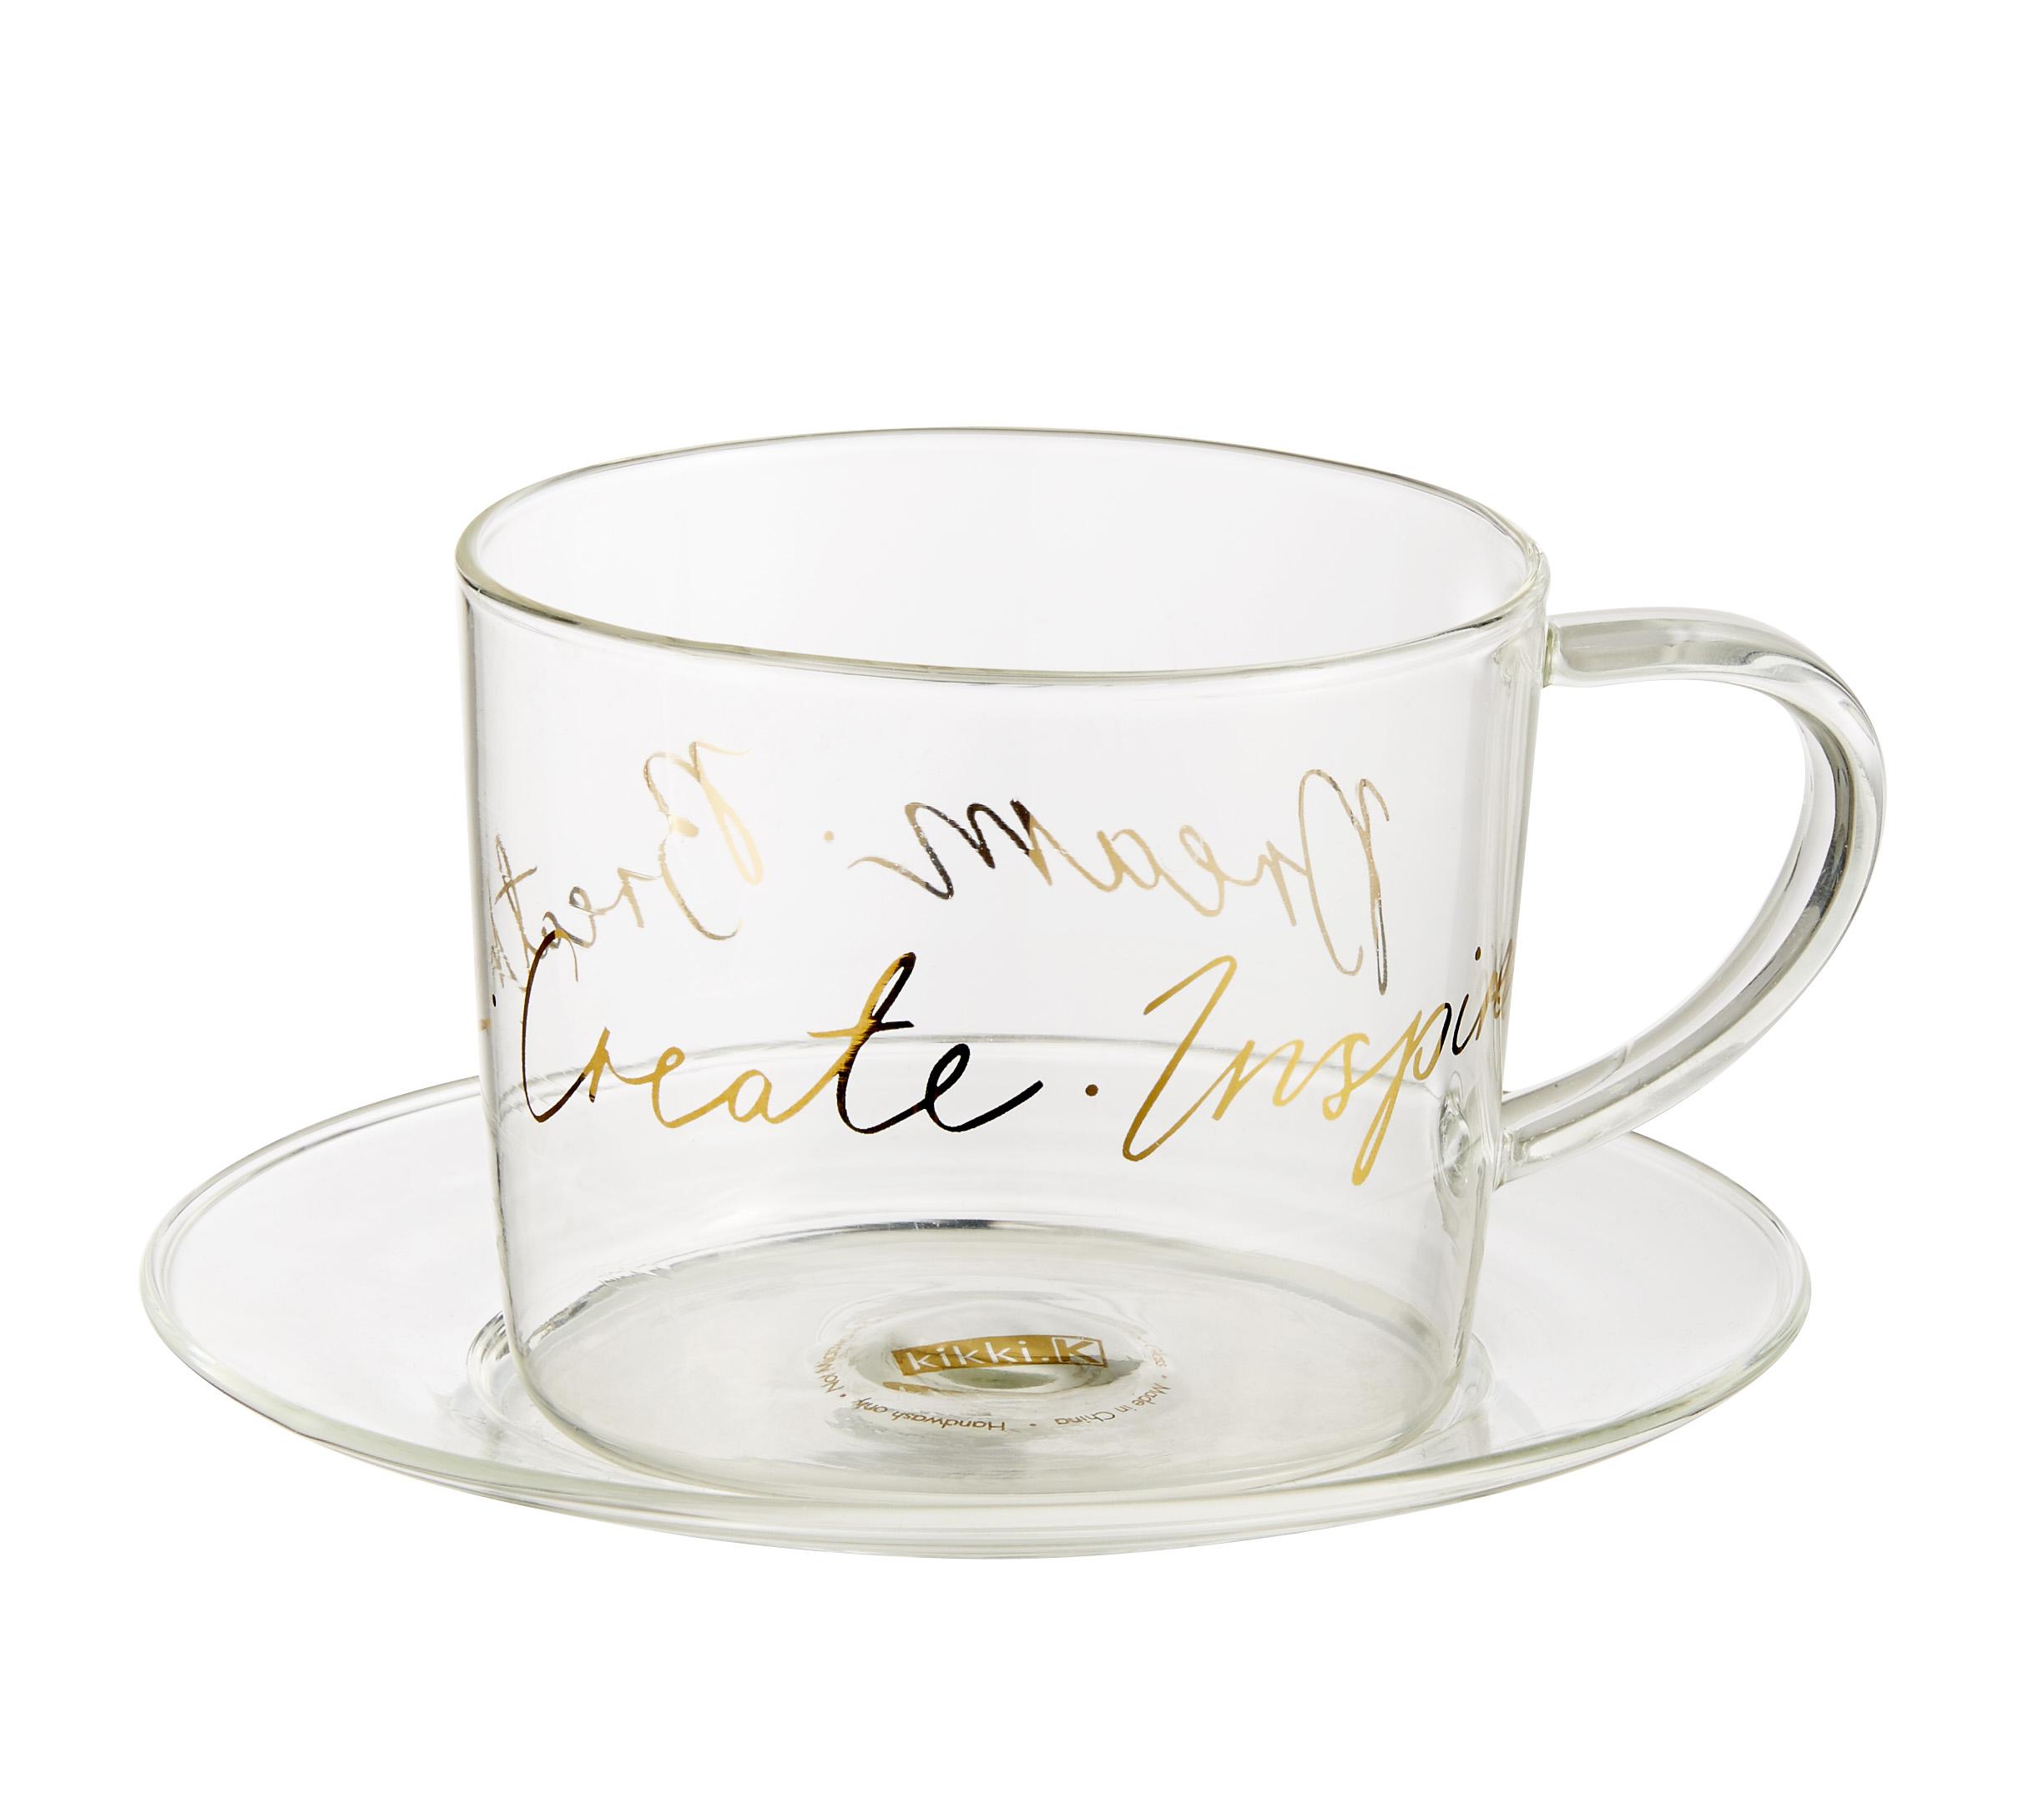 cup_&_saucer_quote_svenska_hem_gold_hero.jpg